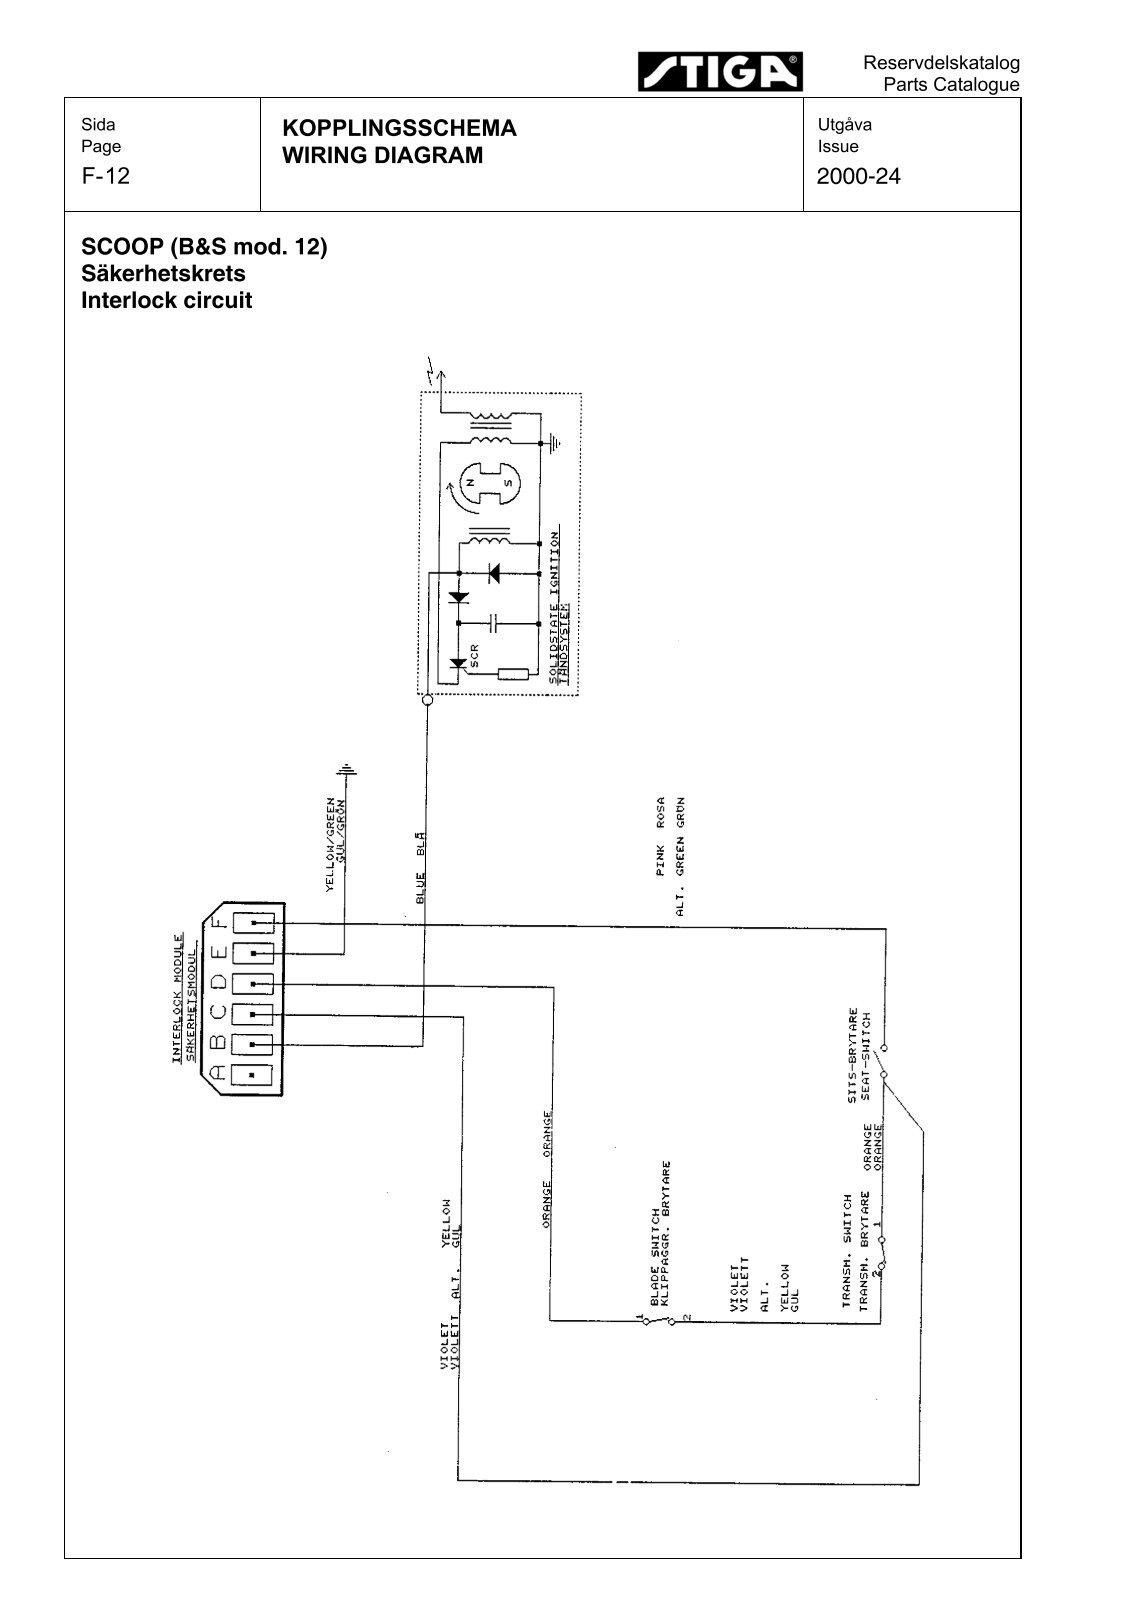 Bmw Wiring Diagram: 15071233 Wiring Diagram